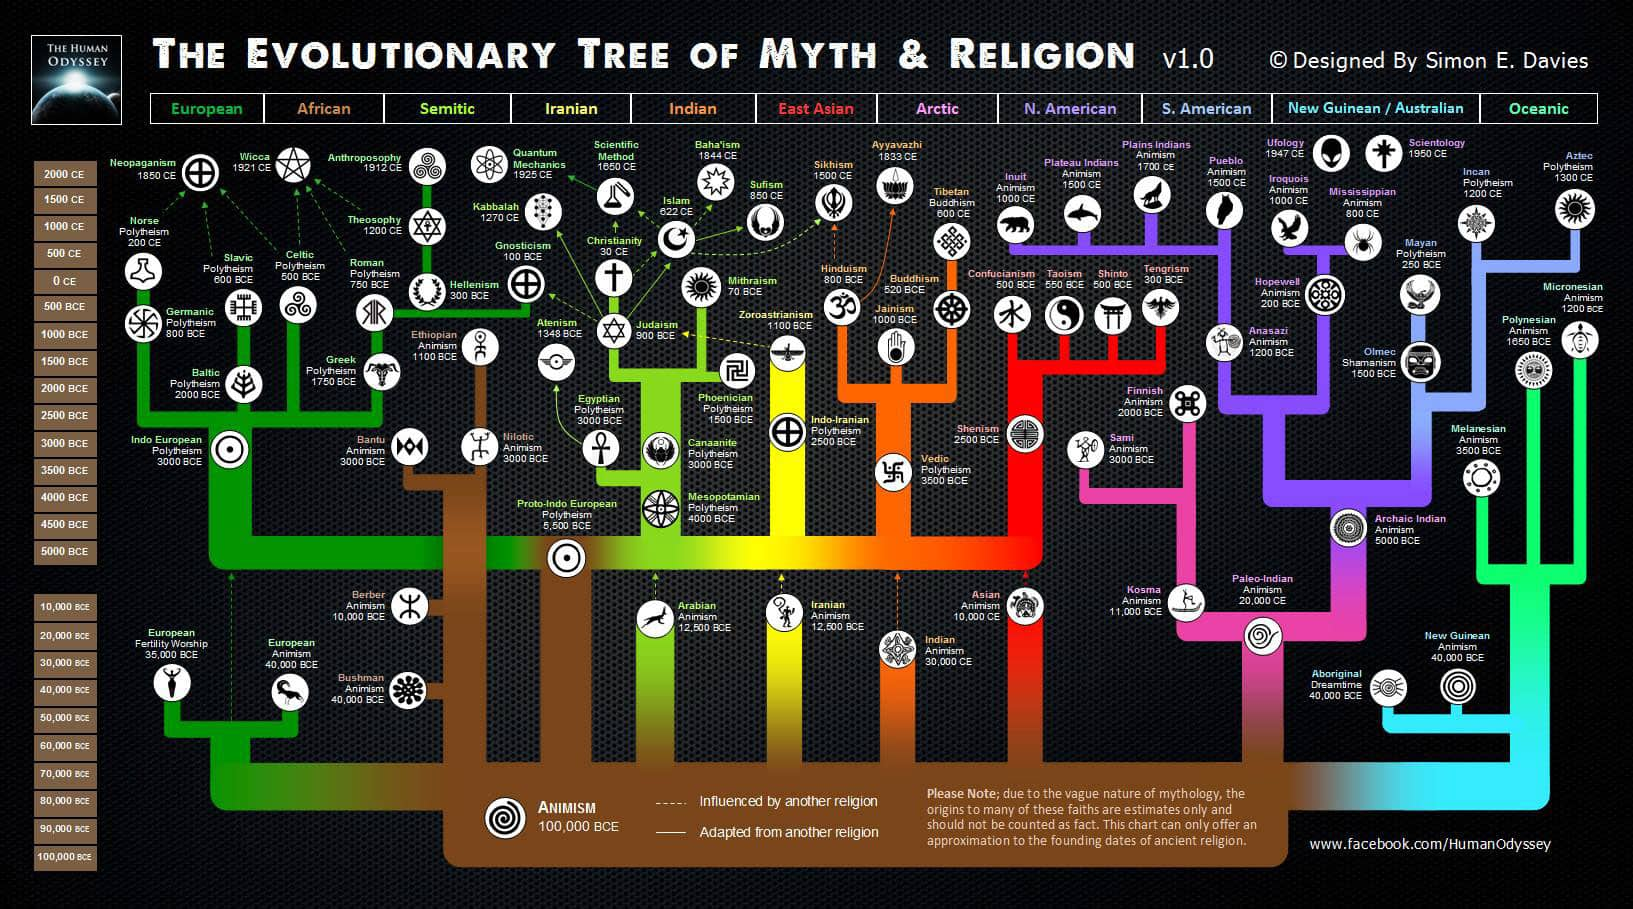 Timeline of Myth and Religion